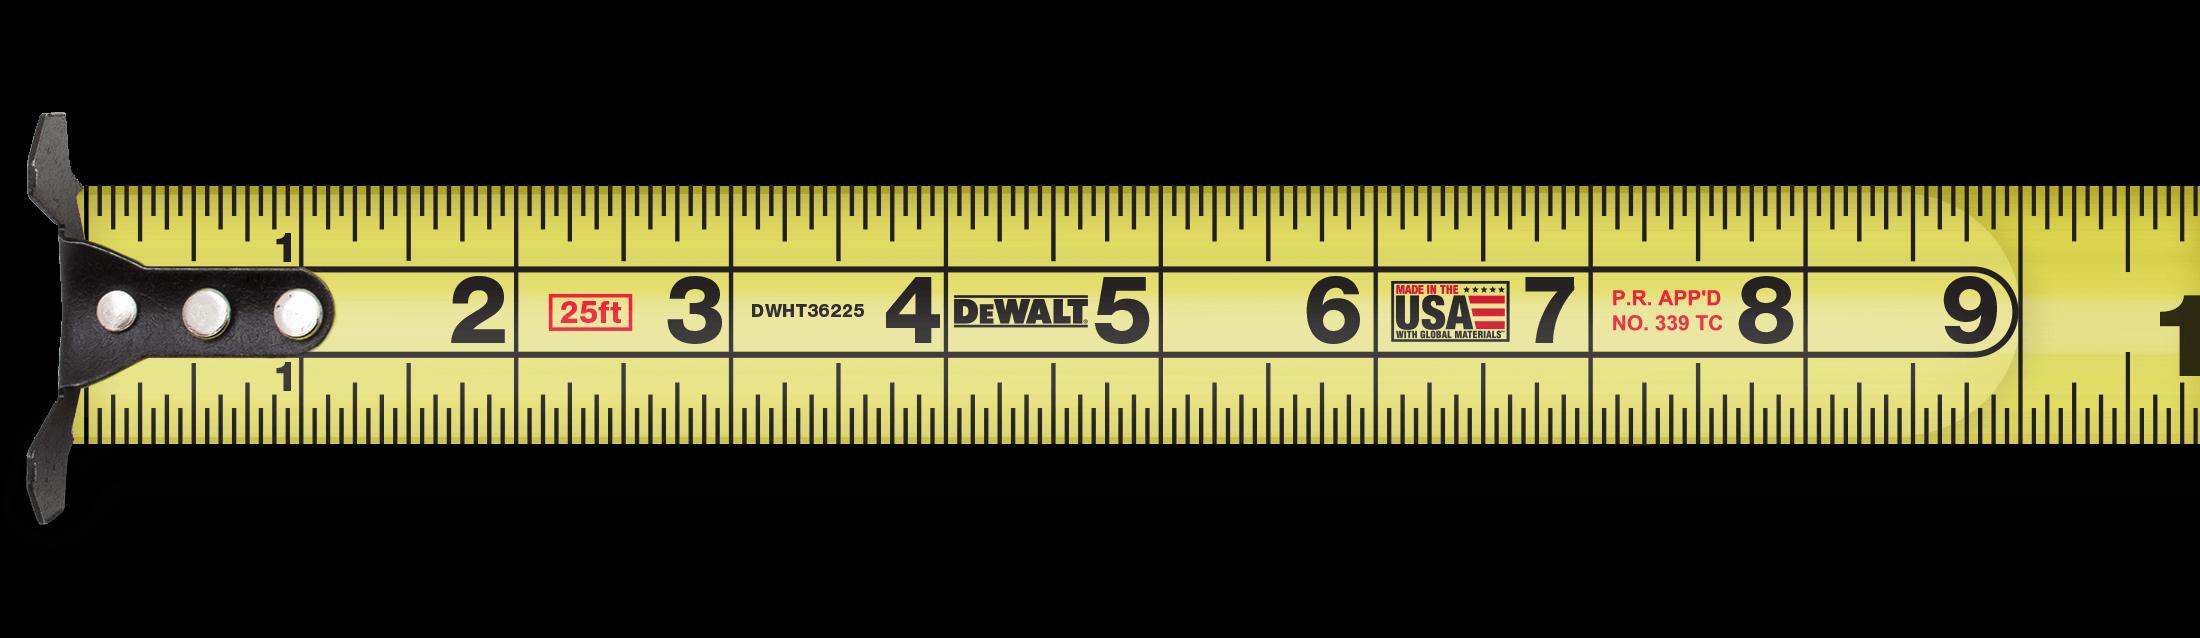 Measure Tape Png Image Tape Measurements